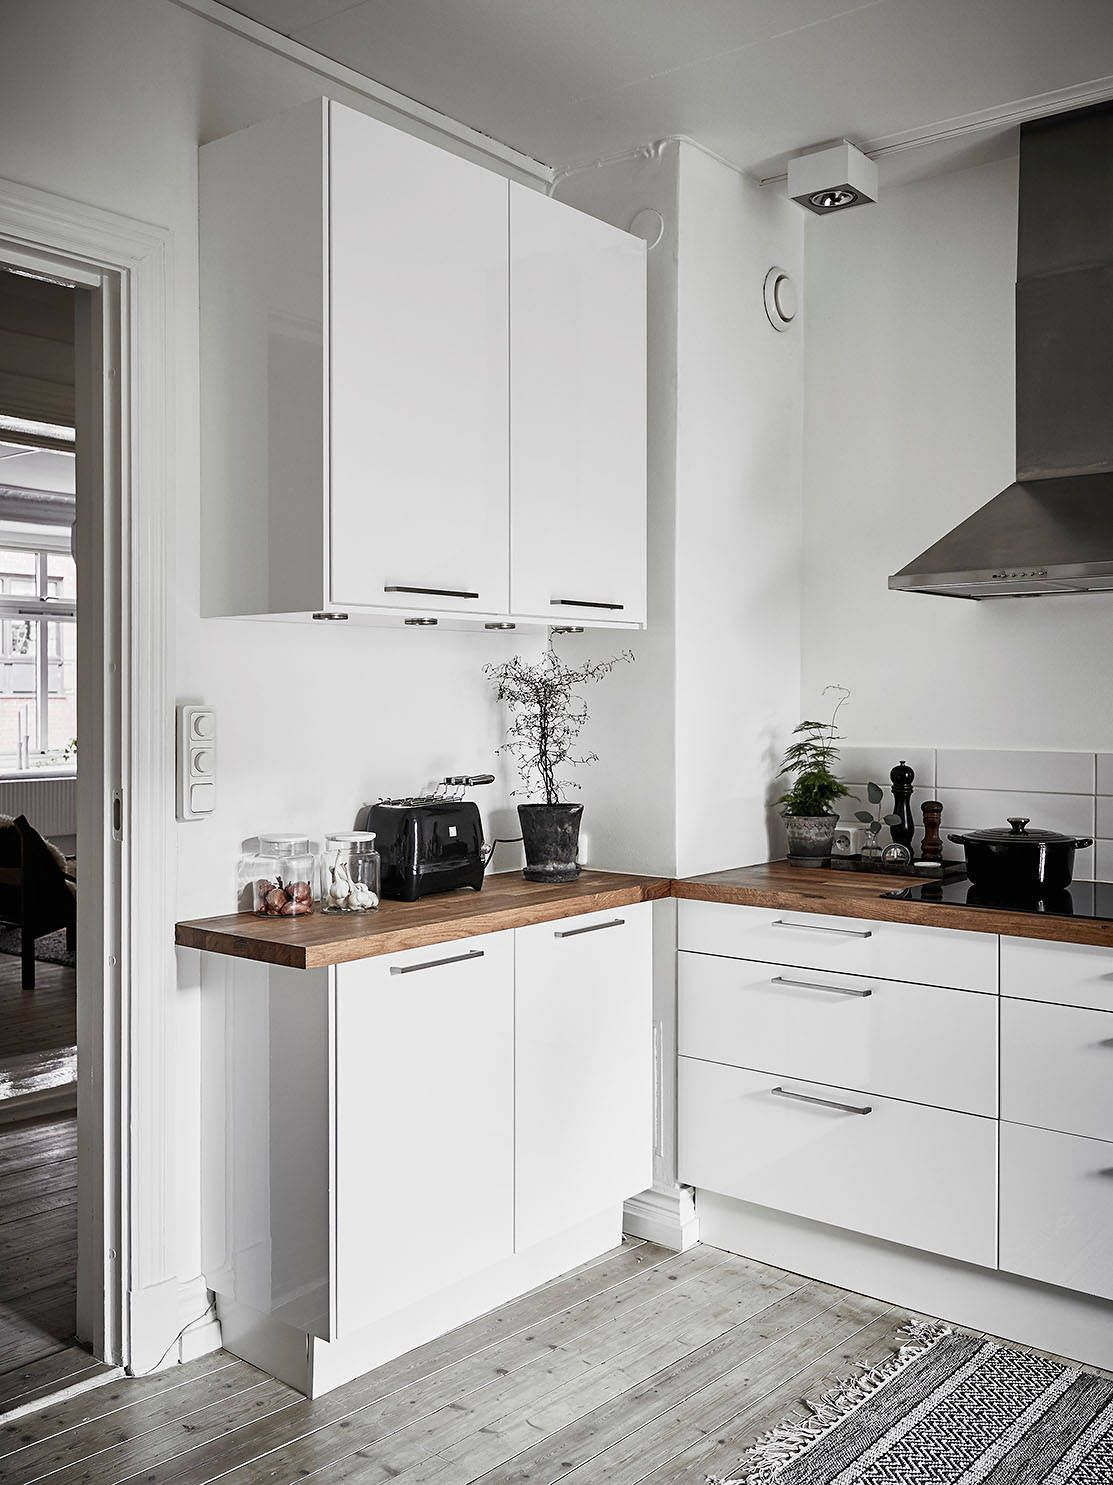 simple white kitchen galley kitchen design galley kitchen remodel kitchen design small on kitchen remodel galley style id=69424